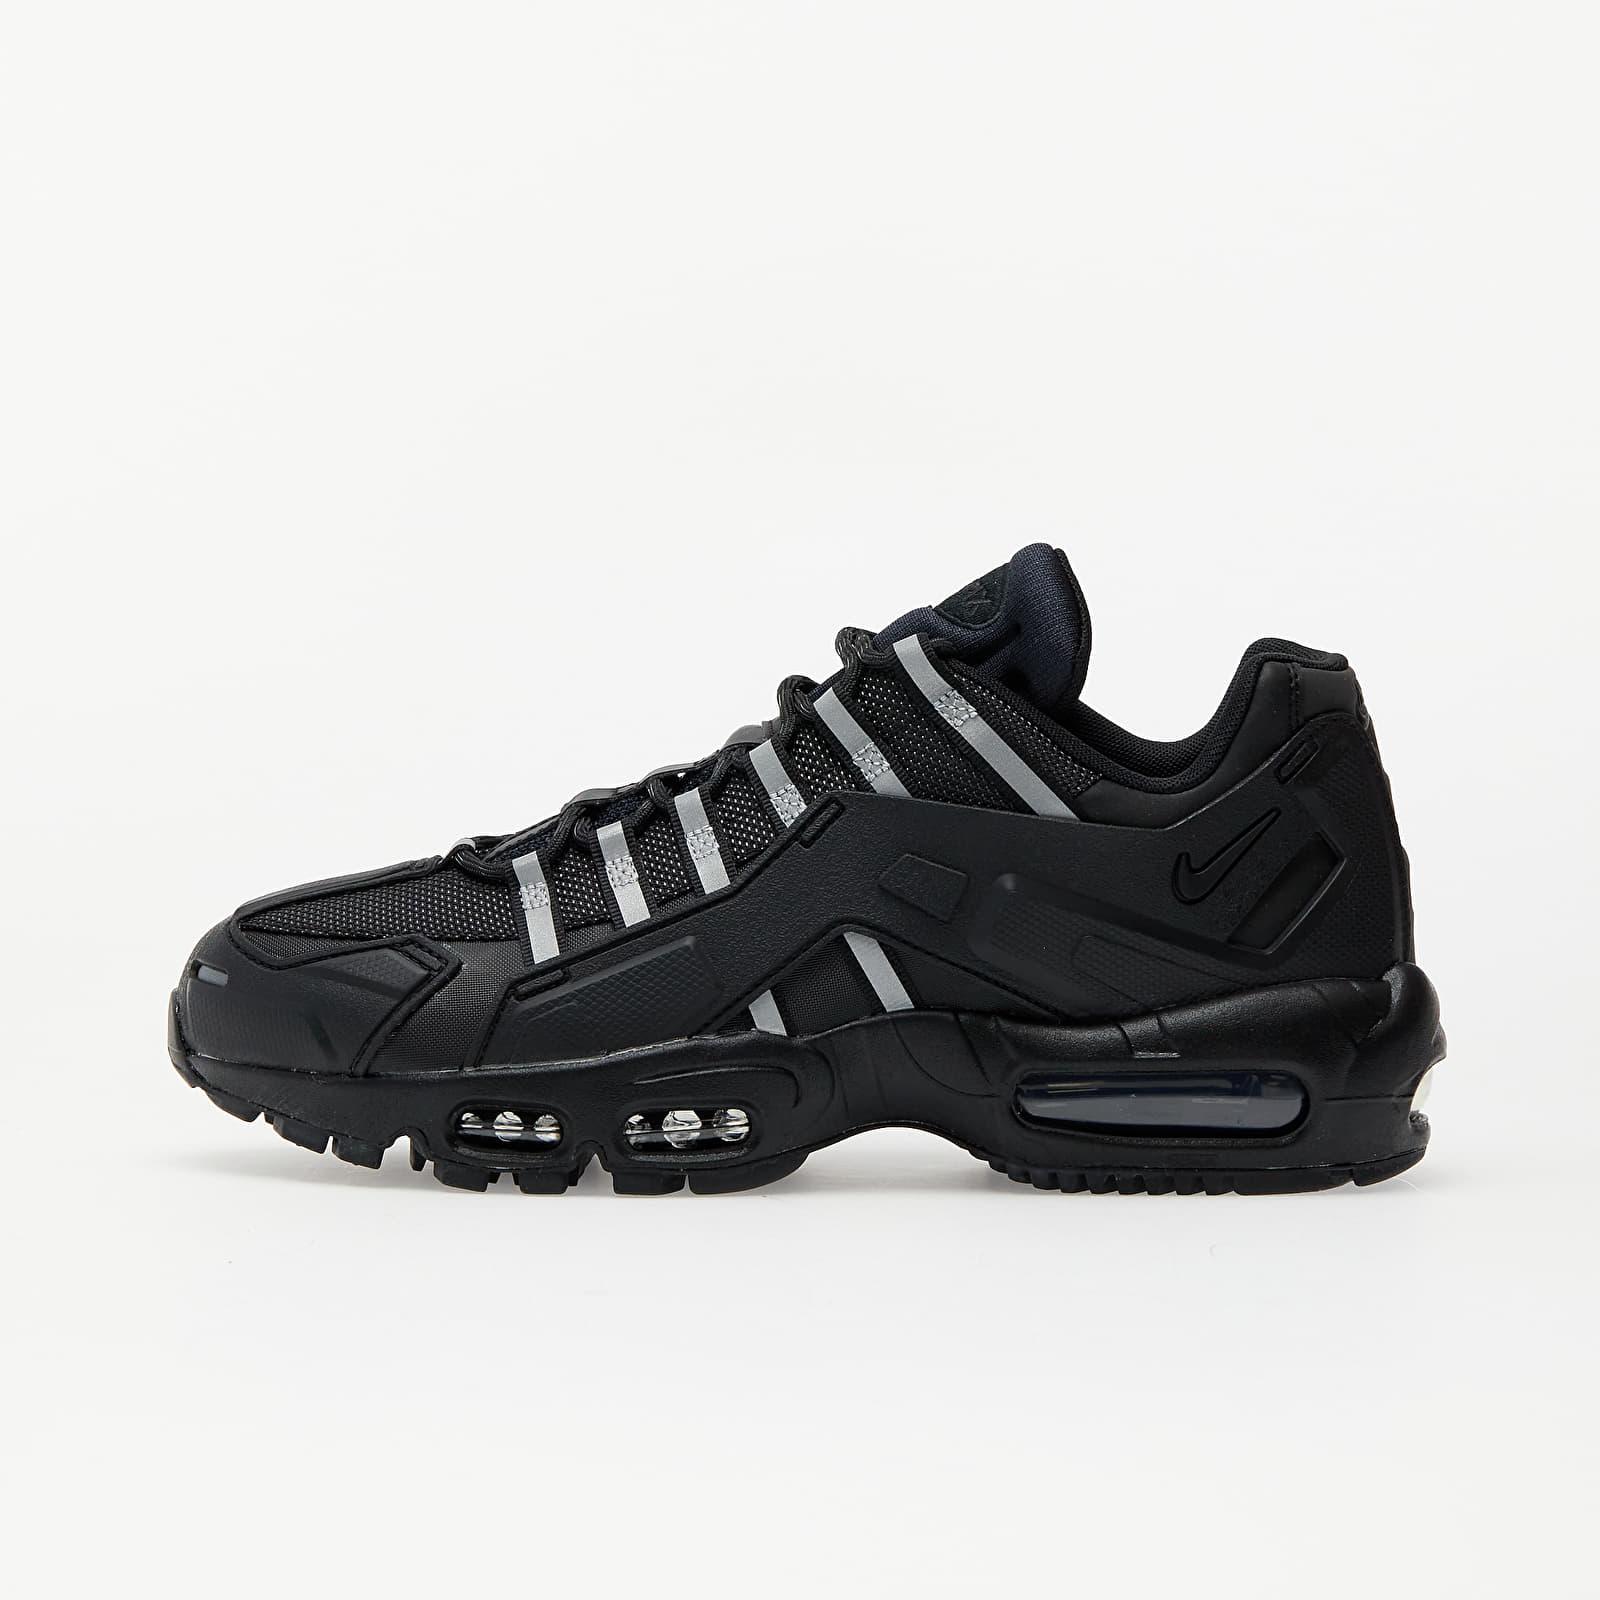 Nike Air Max 95 NDSTRKT Black/ Black-Black CZ3591-001